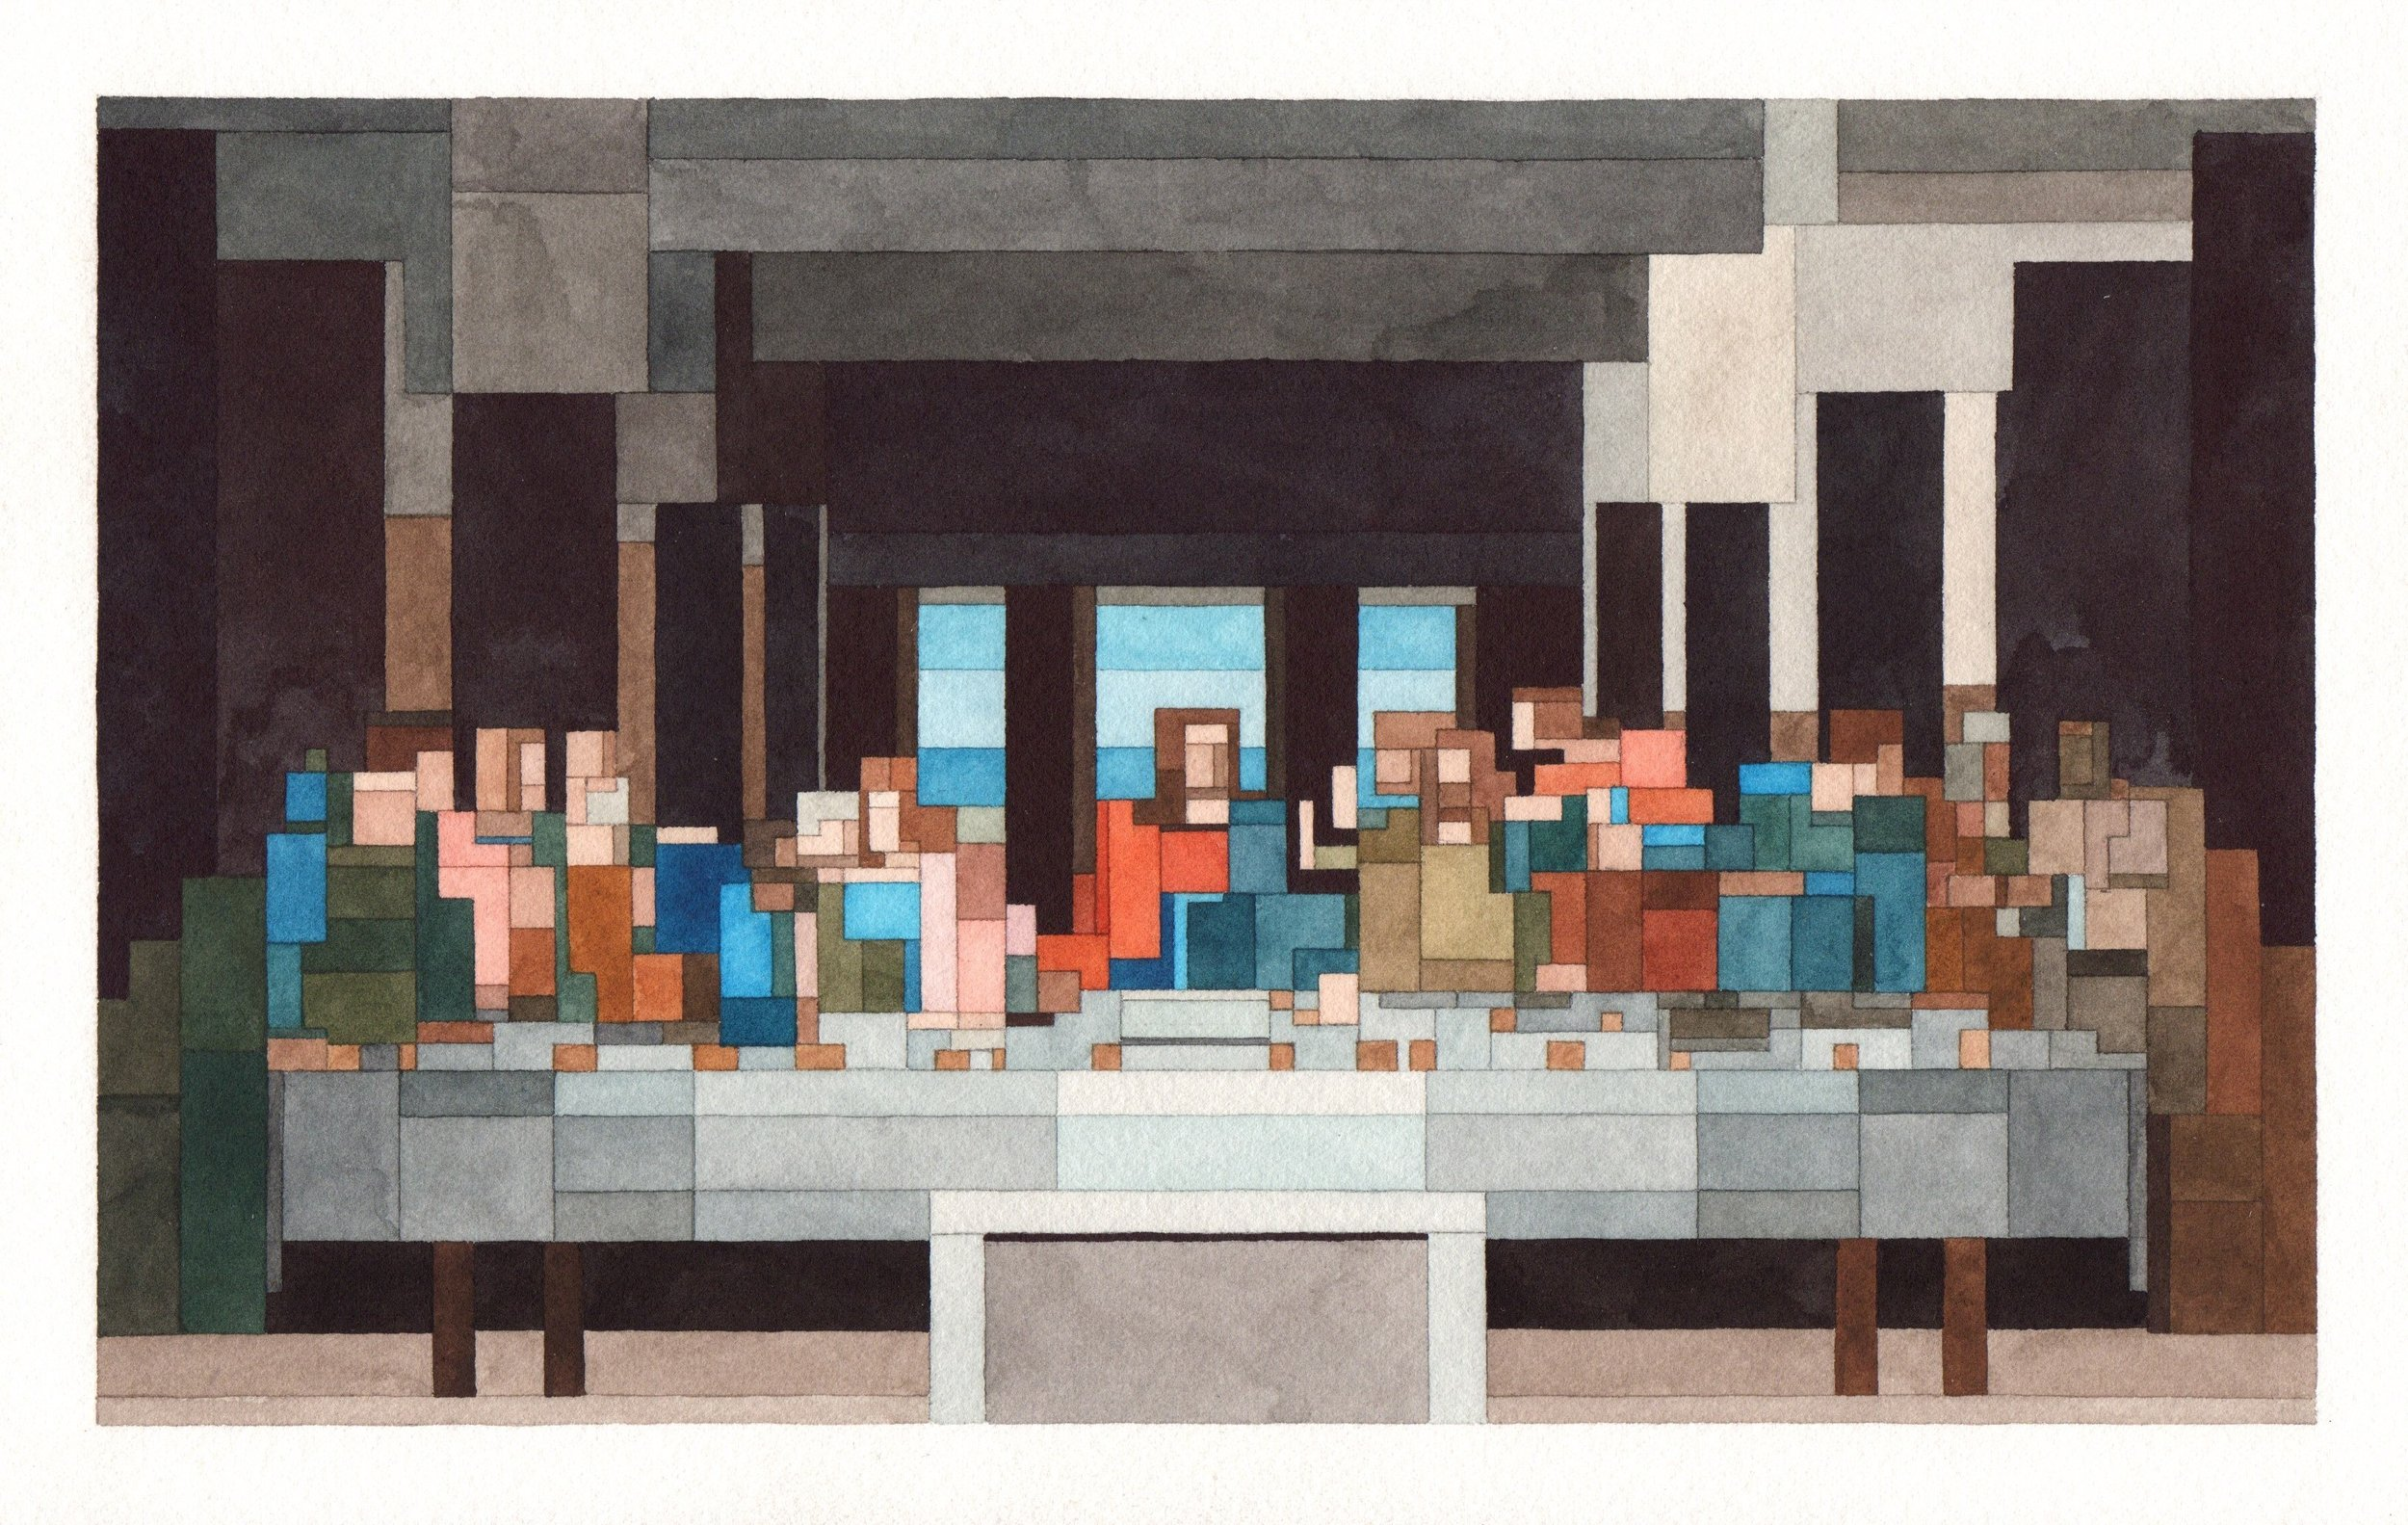 Adam-Lister-The-Last-Supper-17.jpg